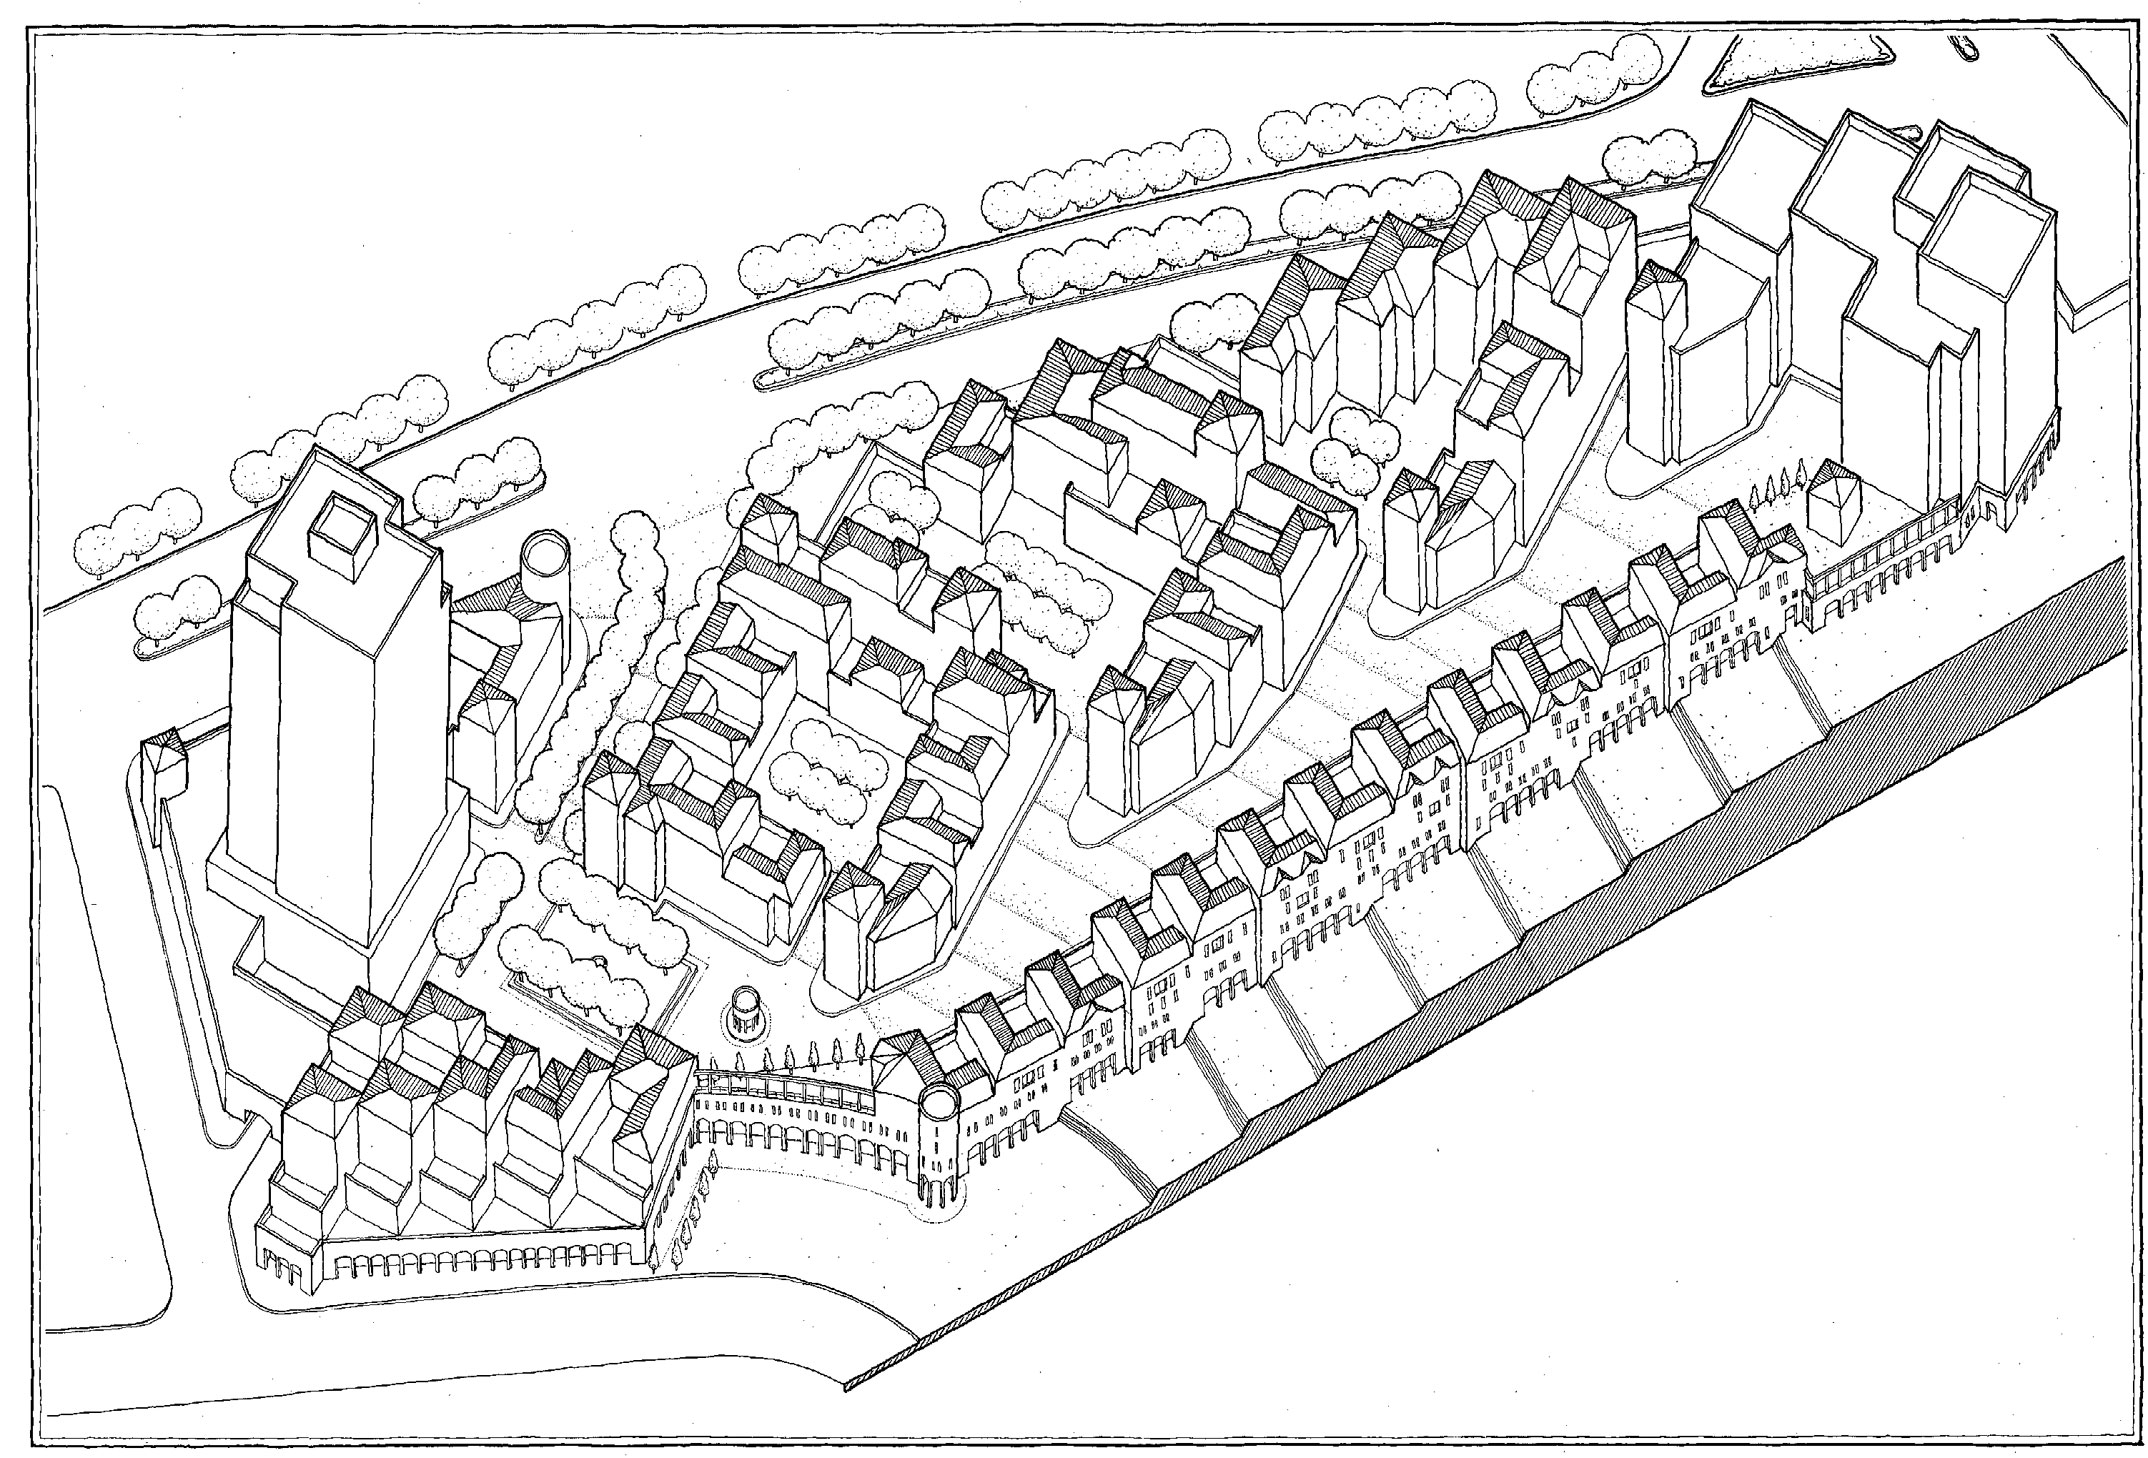 Santa Fe Master Plan - Axon of Housing,